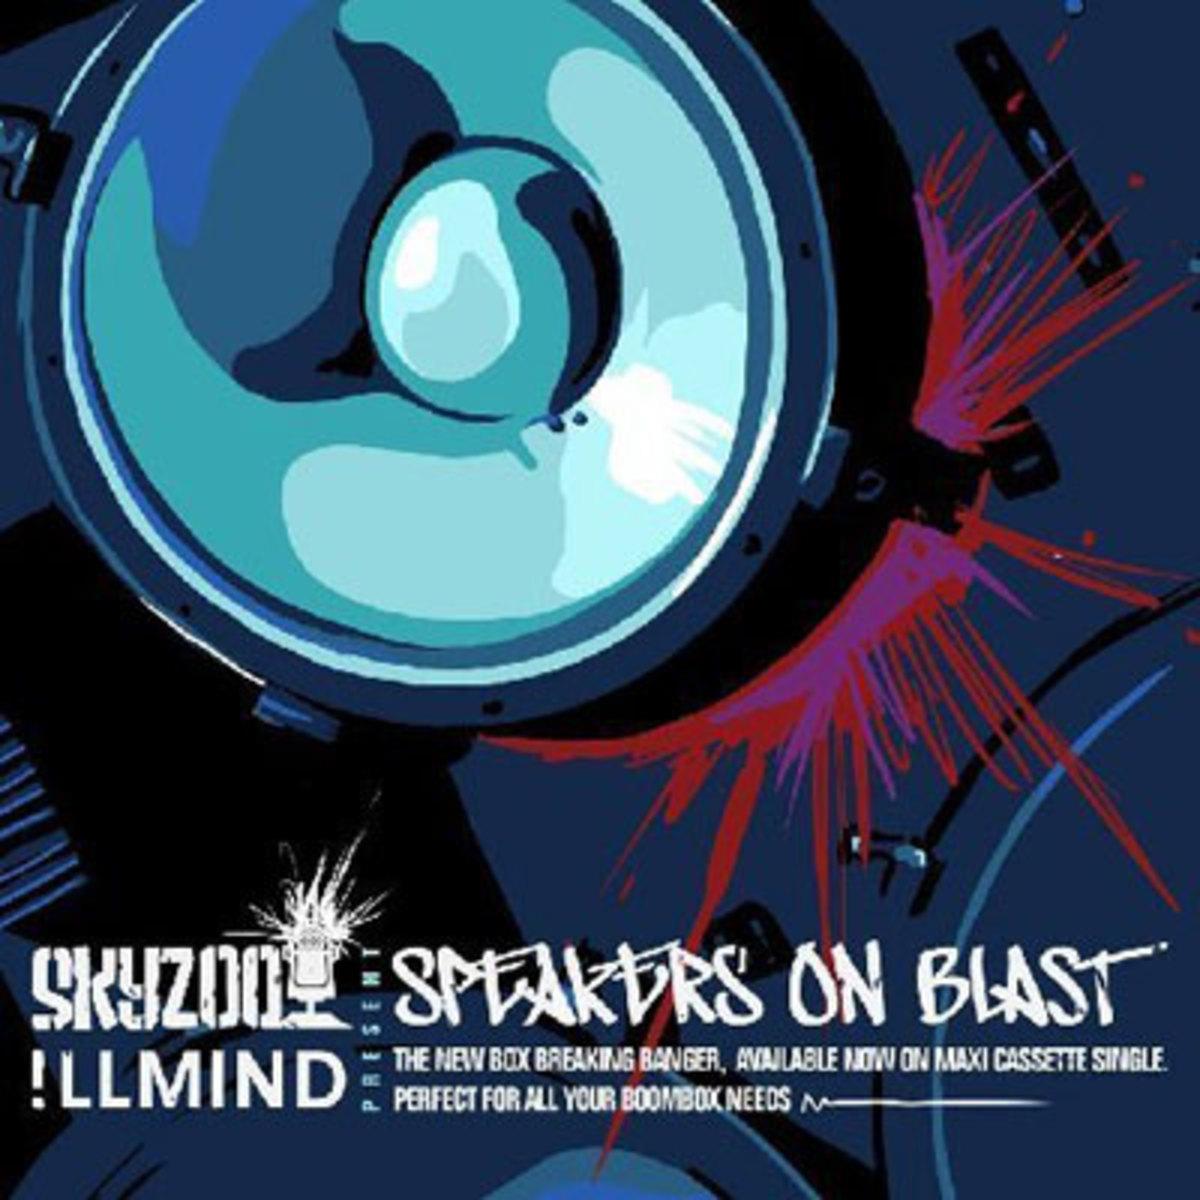 skyzoo-speakersonblast.jpg